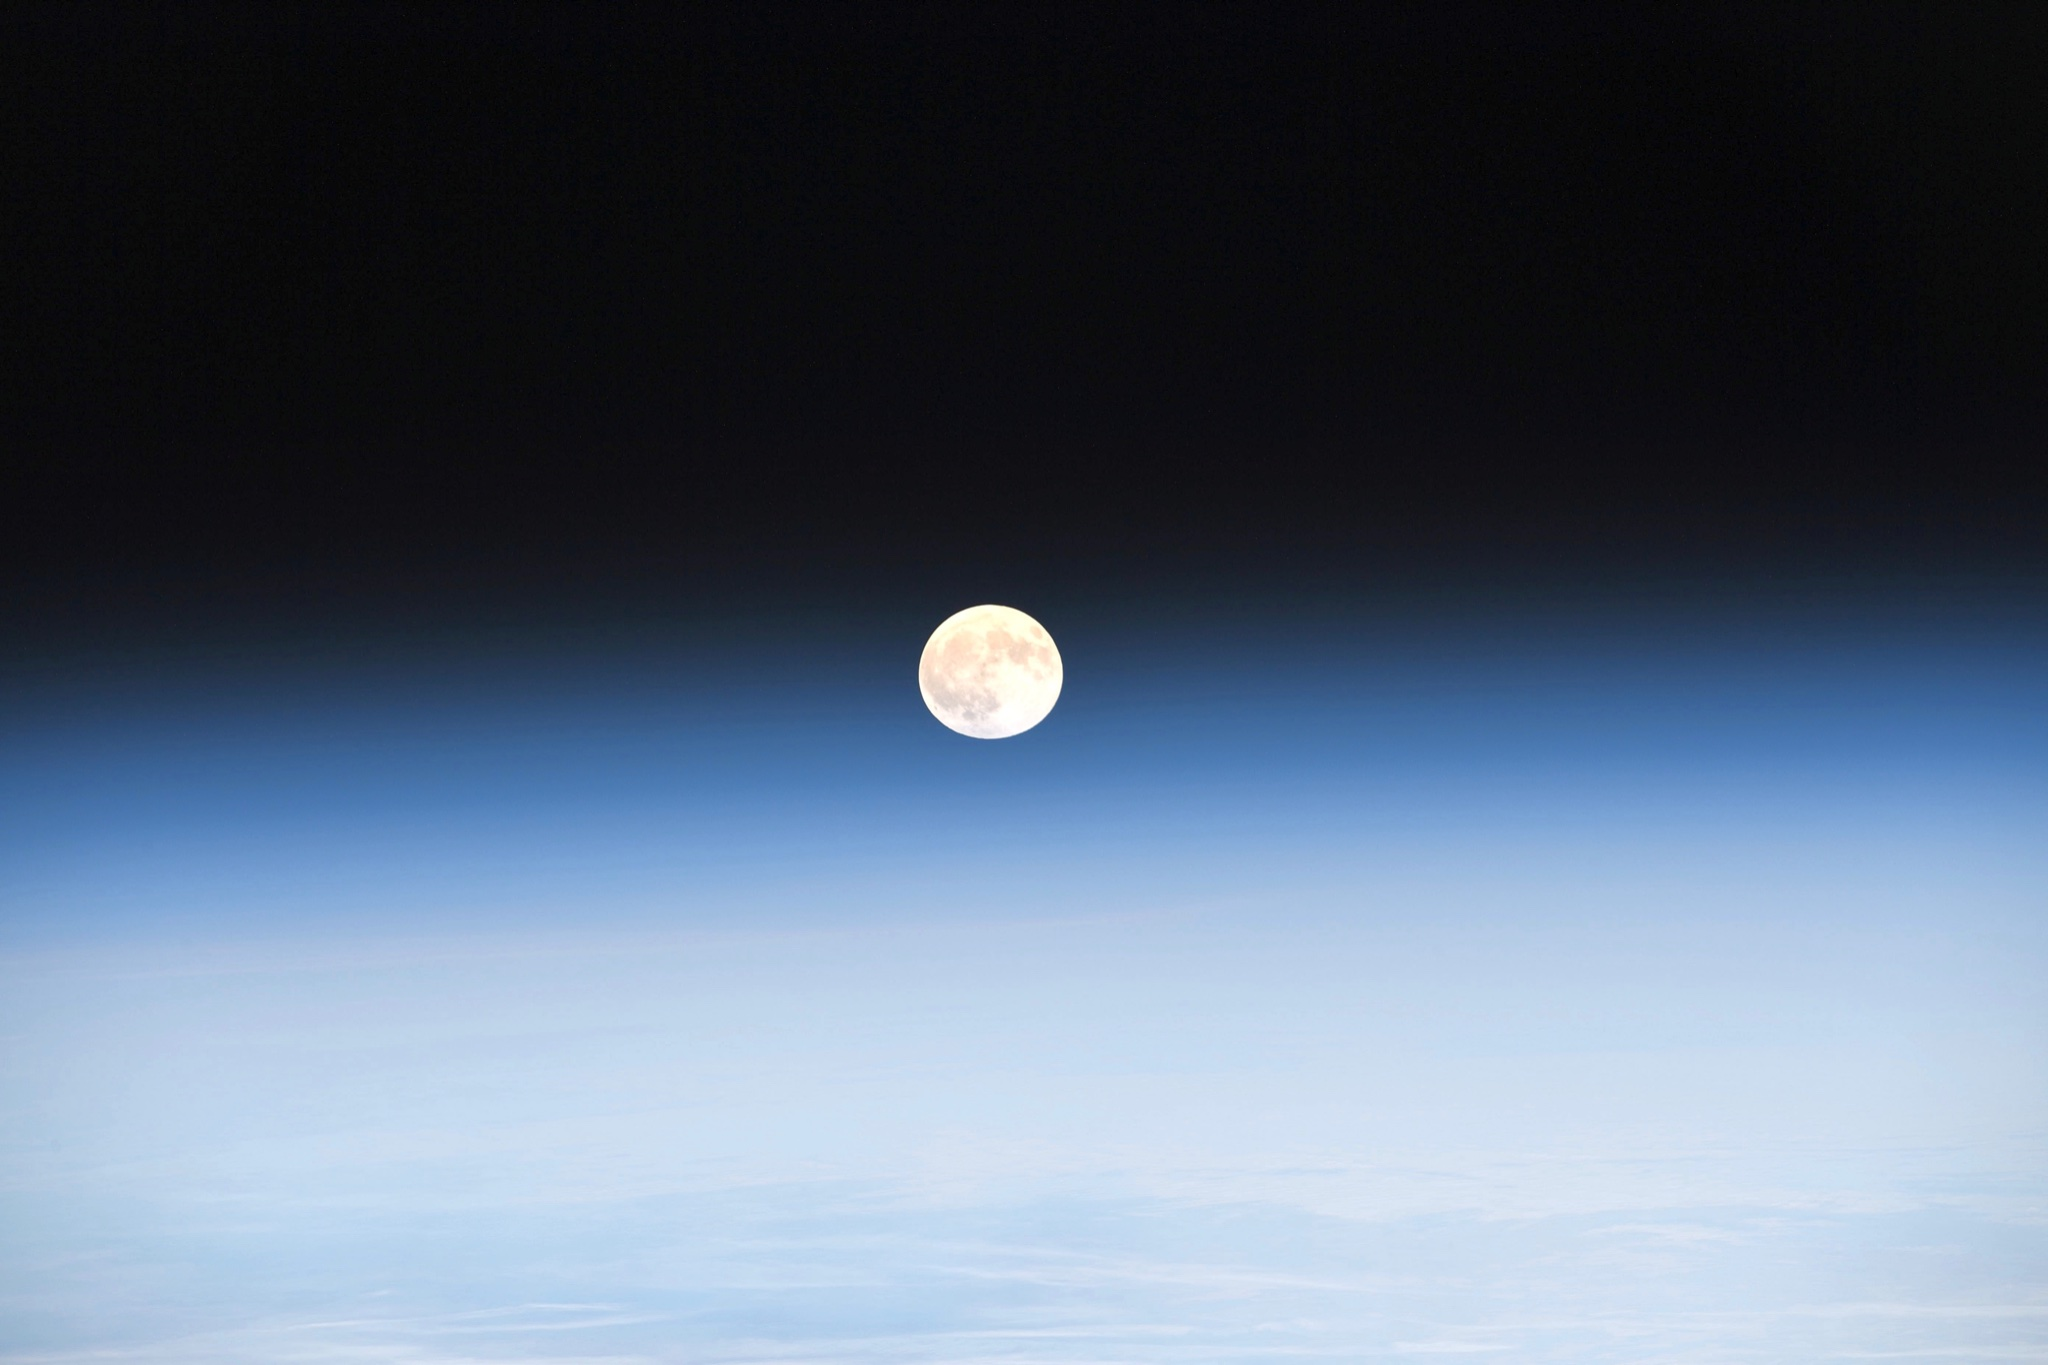 noguchi-moonrise-1.jpg